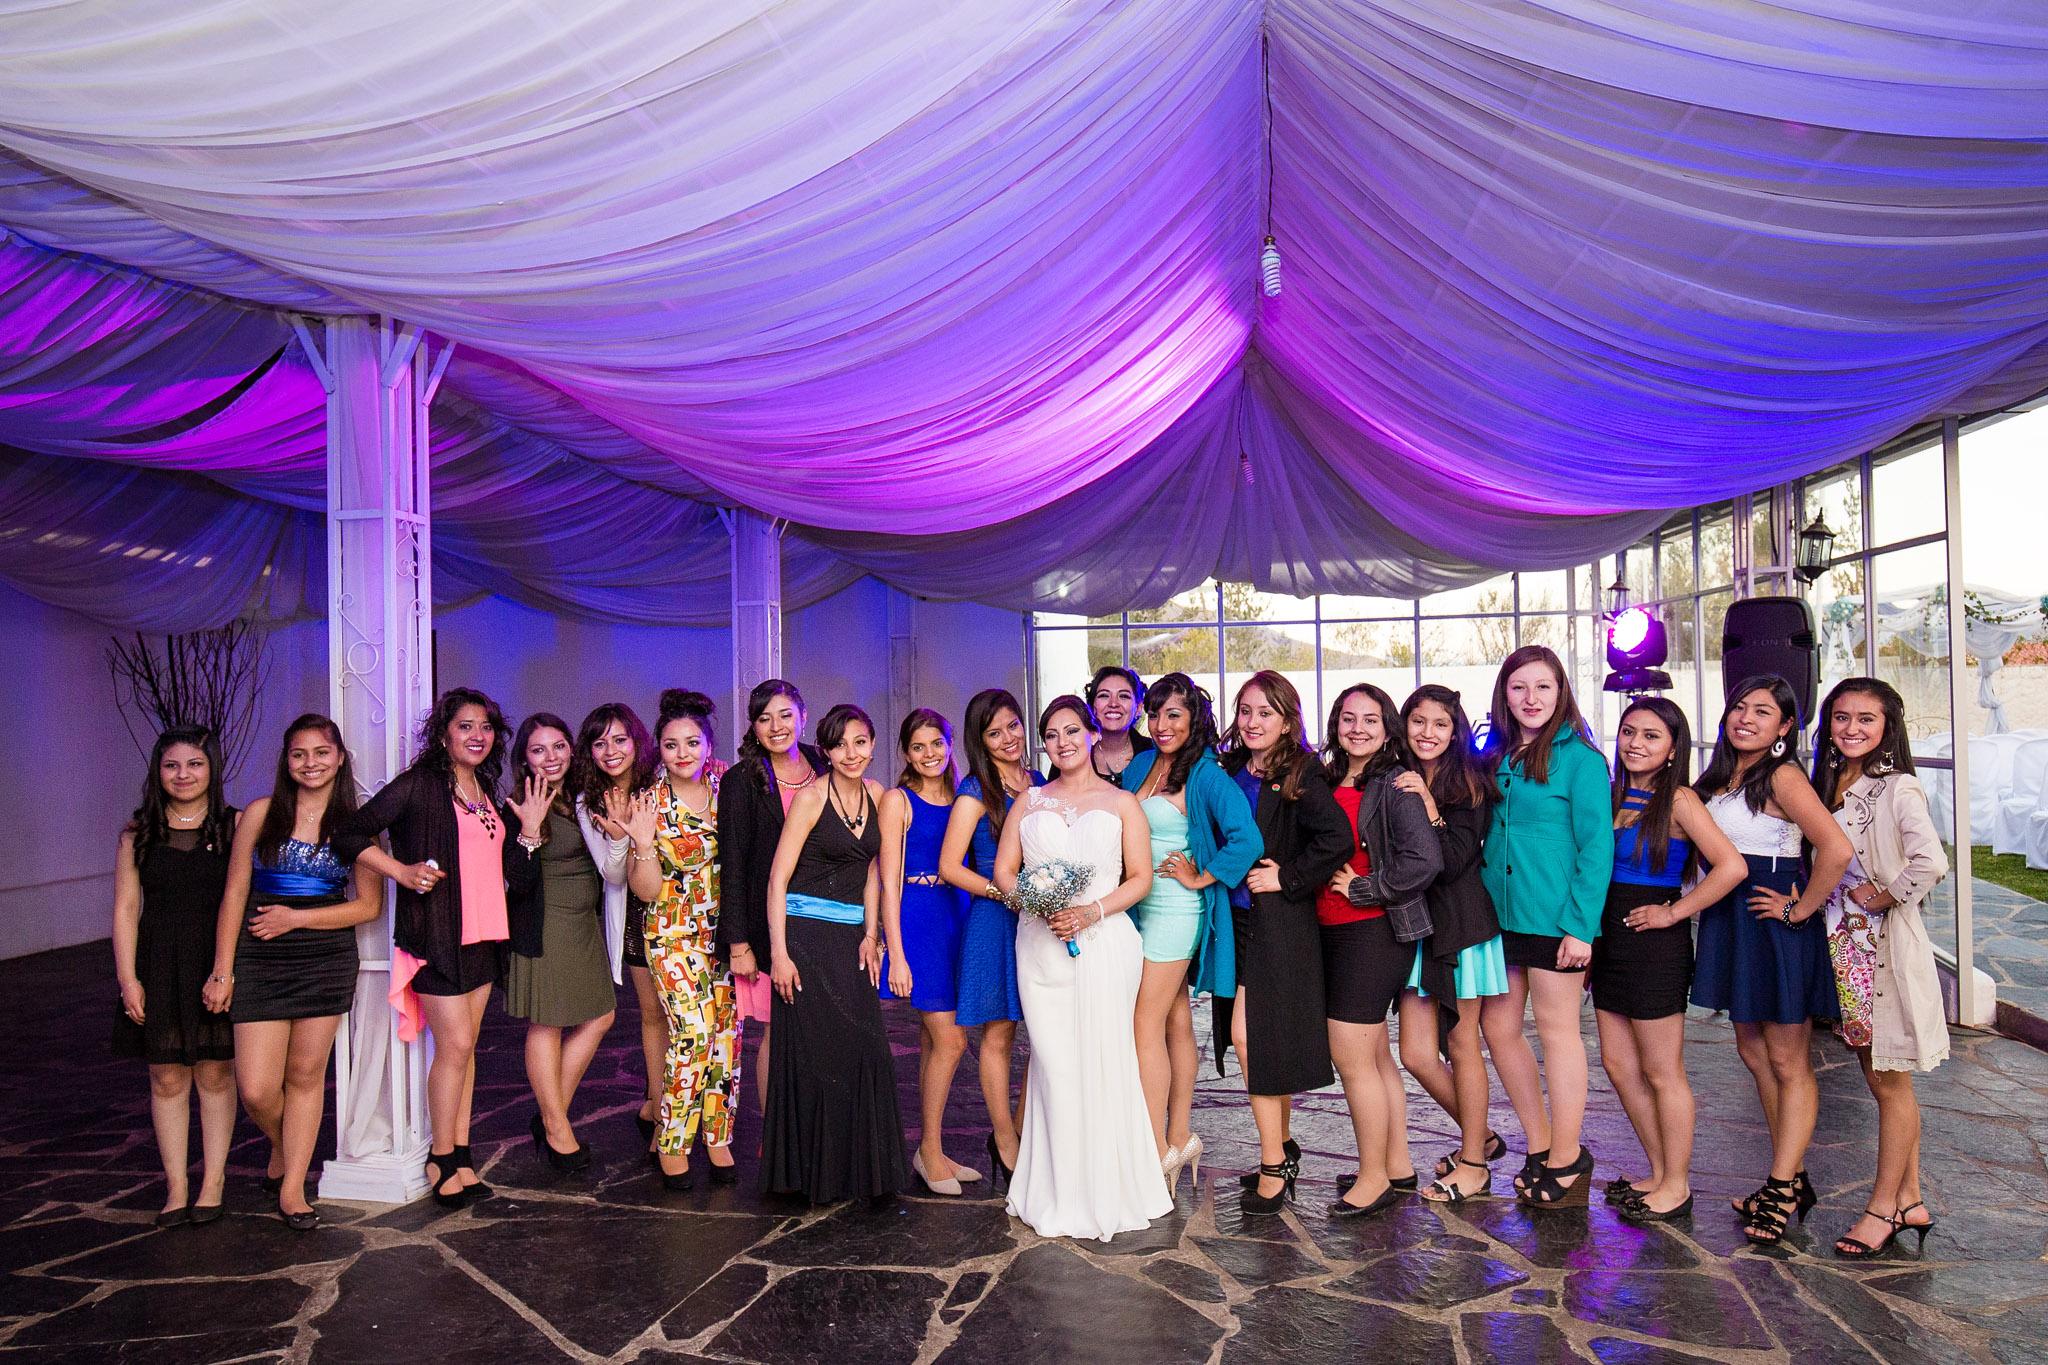 Wedding_Travellers_Destination_Wedding_Bolivia-330.jpg